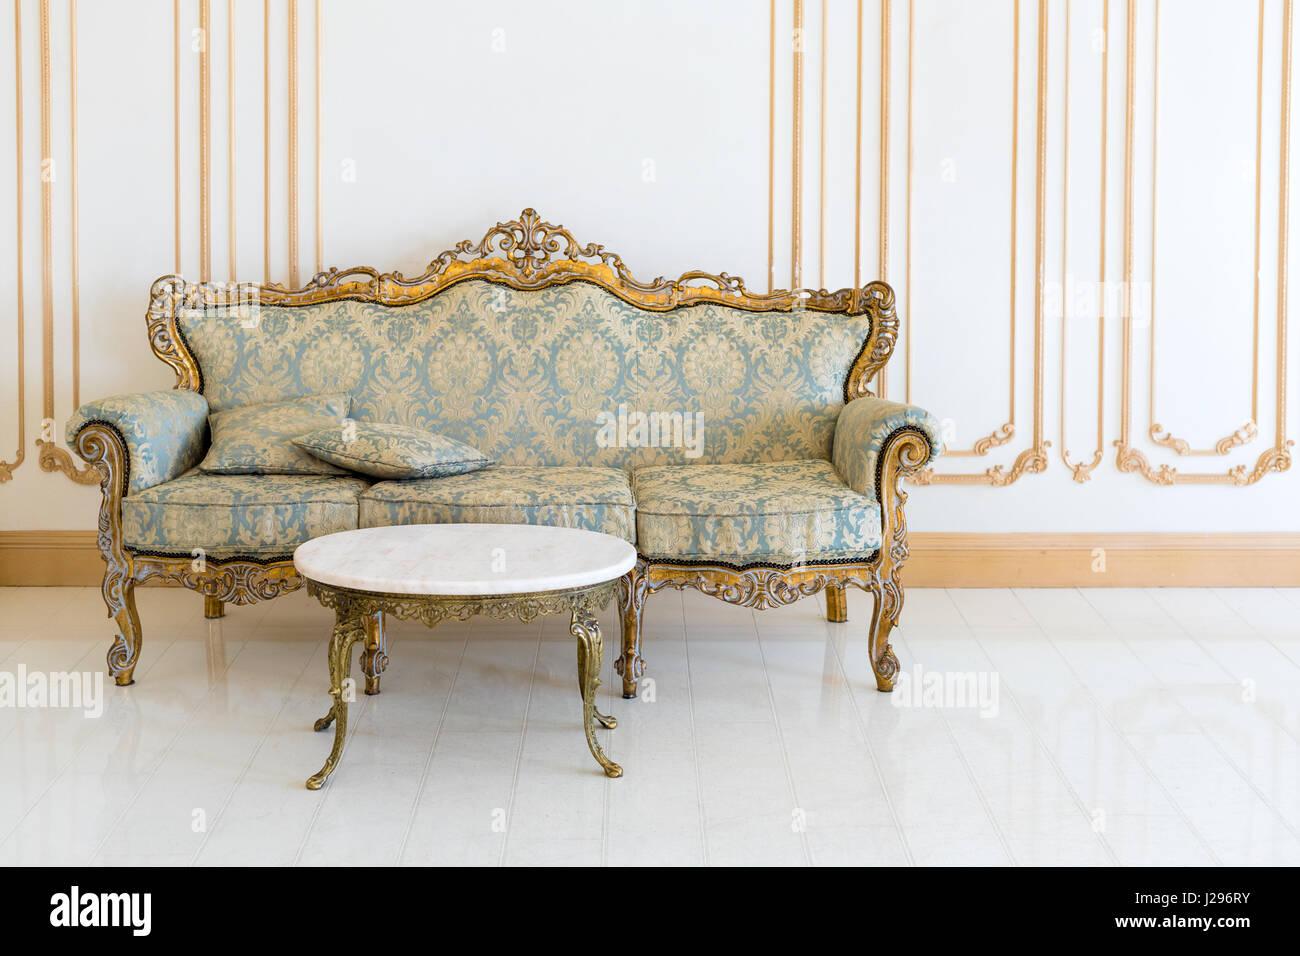 Luxury livingroom in light colors with golden furniture details ...